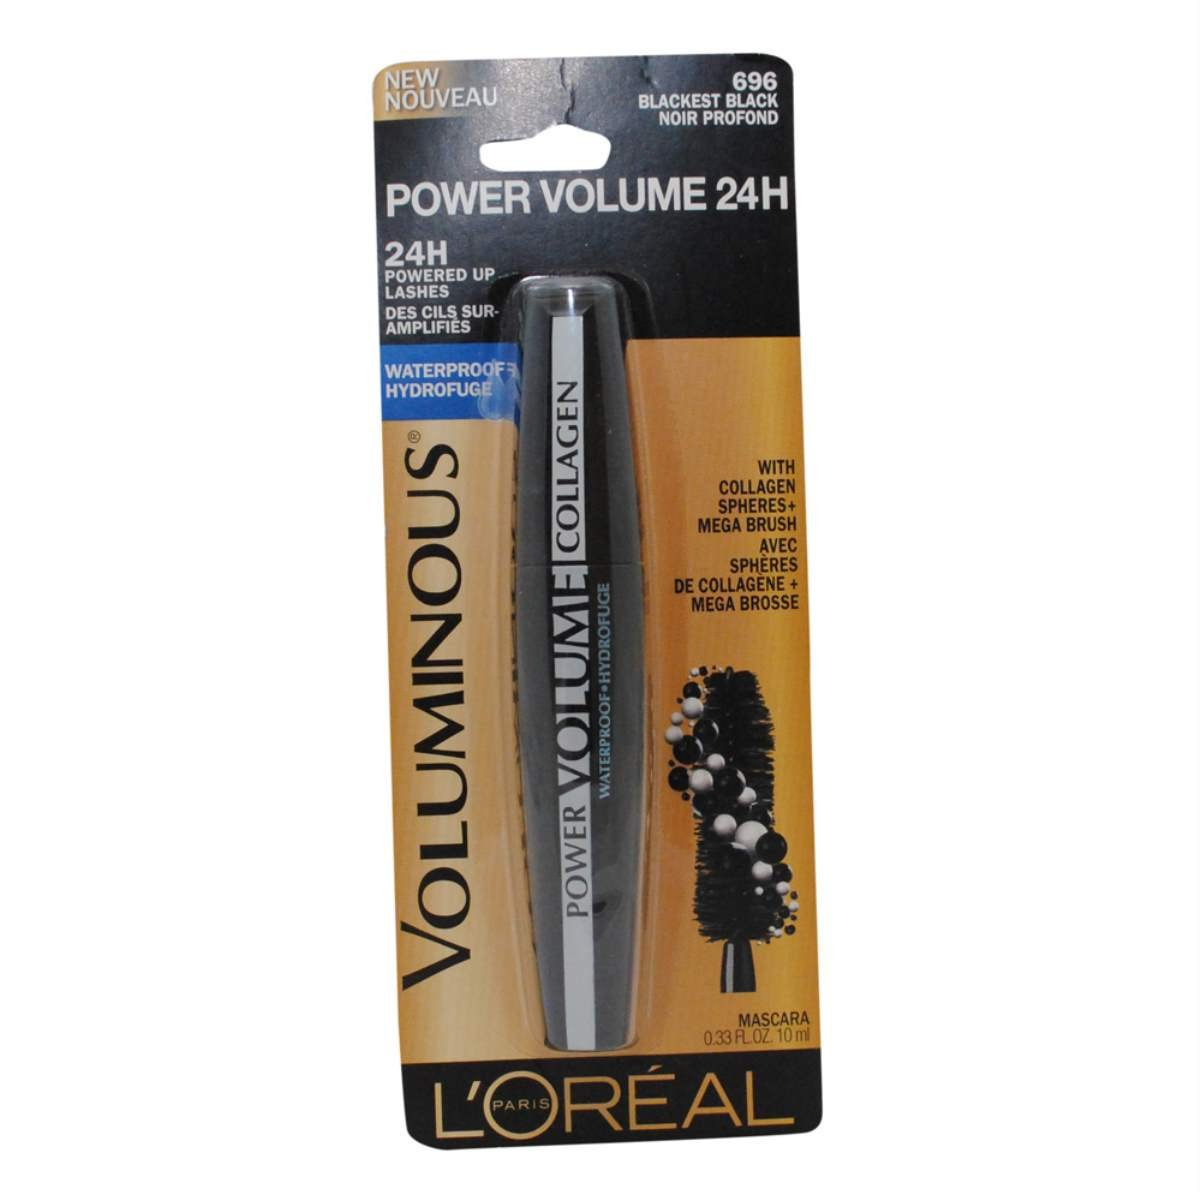 Amazon.com : 2 Pack- LOreal Power Volume 24H Waterproof Mascara #696 Blackest Black : Beauty